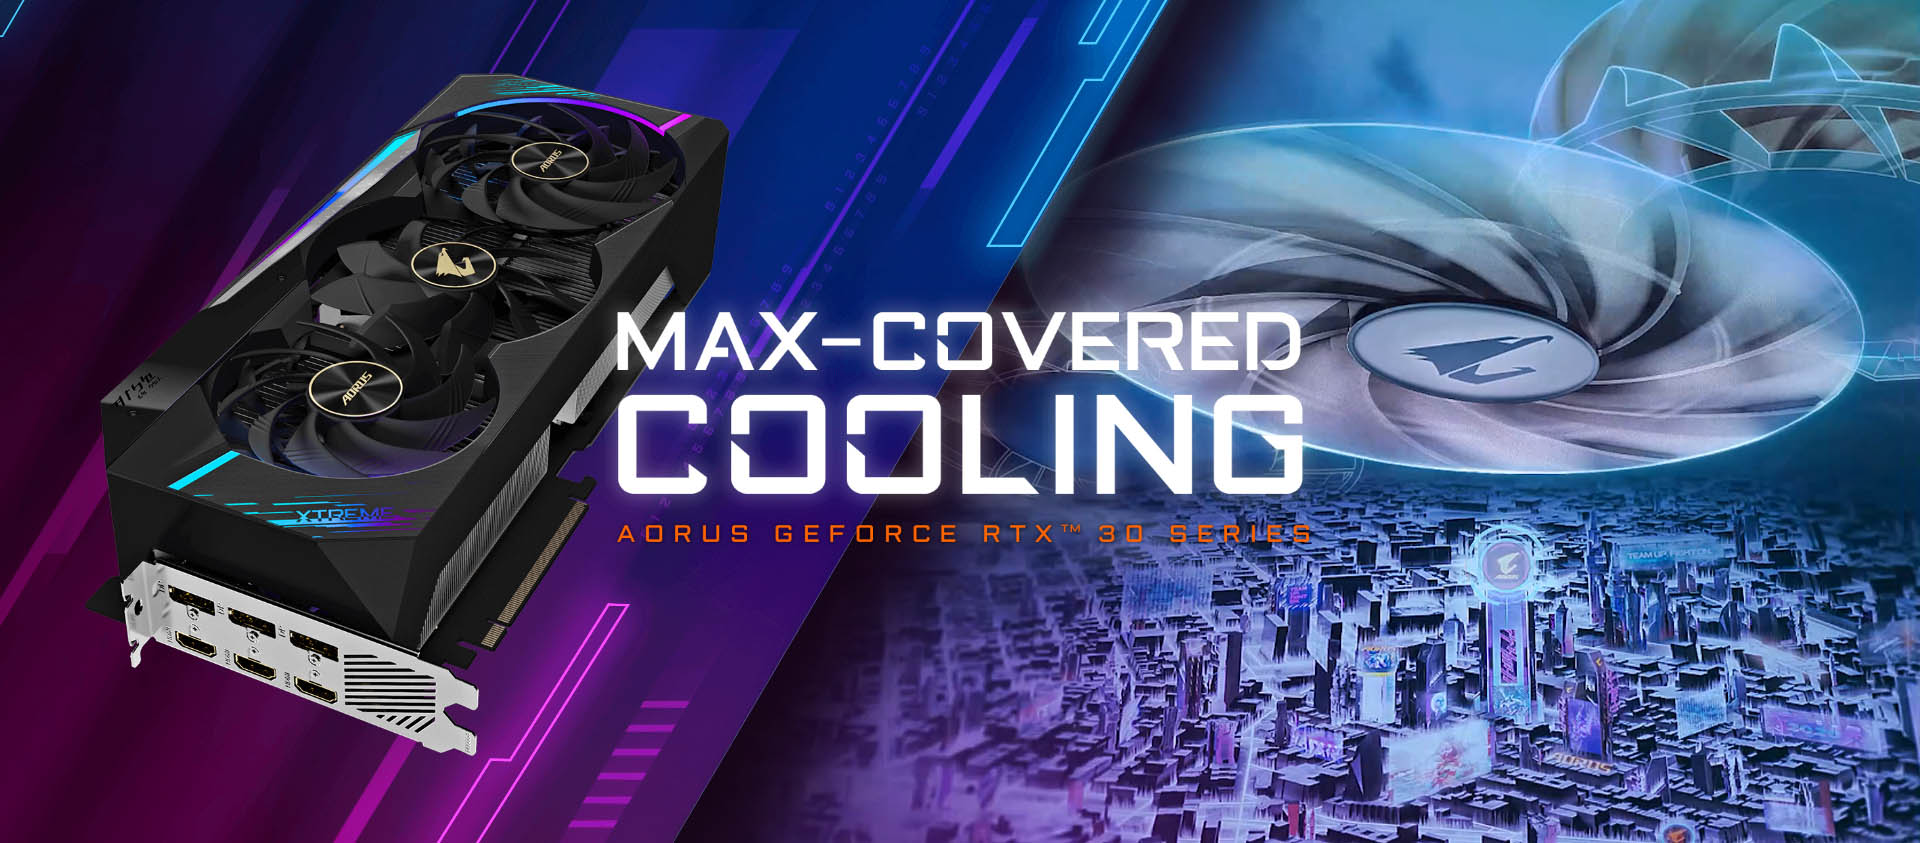 AORUS GeForce RTX™ 3080 Ti XTREME 12G